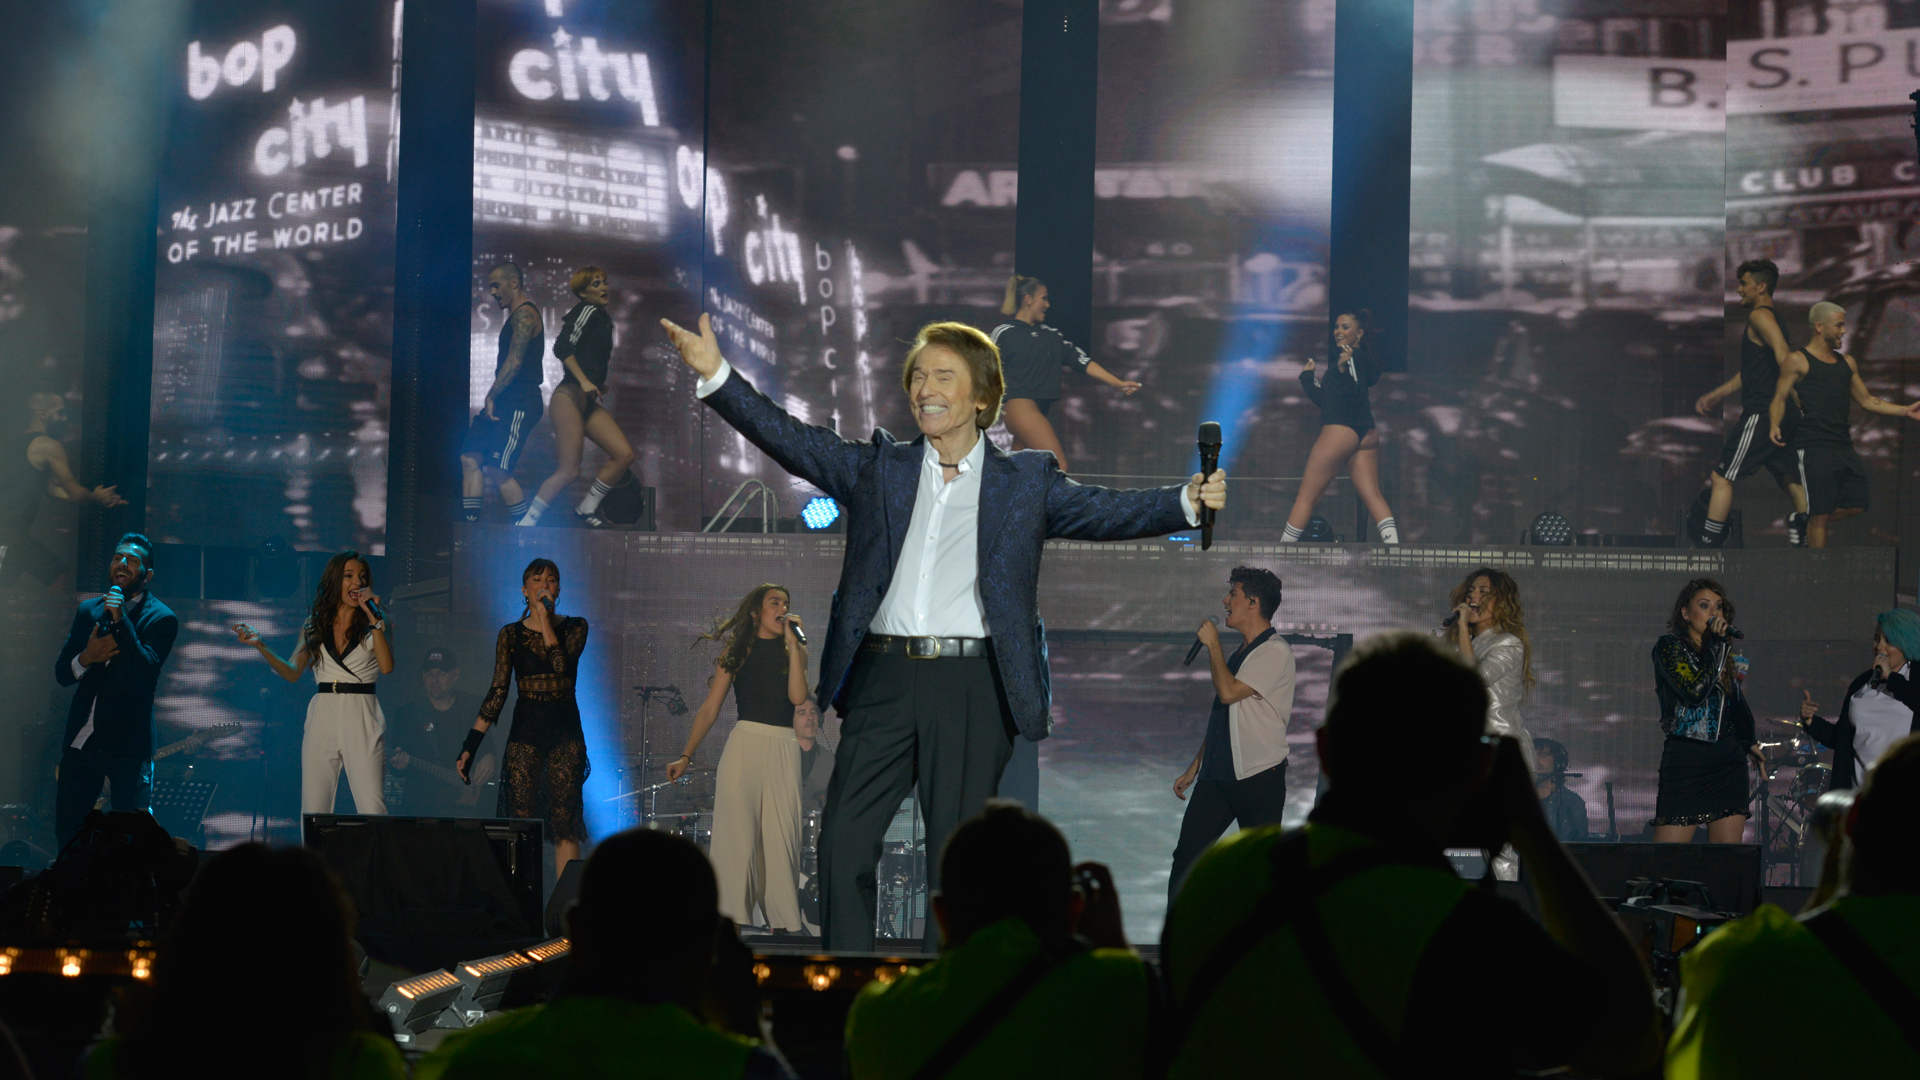 OT Bernabéu - Raphael canta con OT 2017 'Mi gran noche'